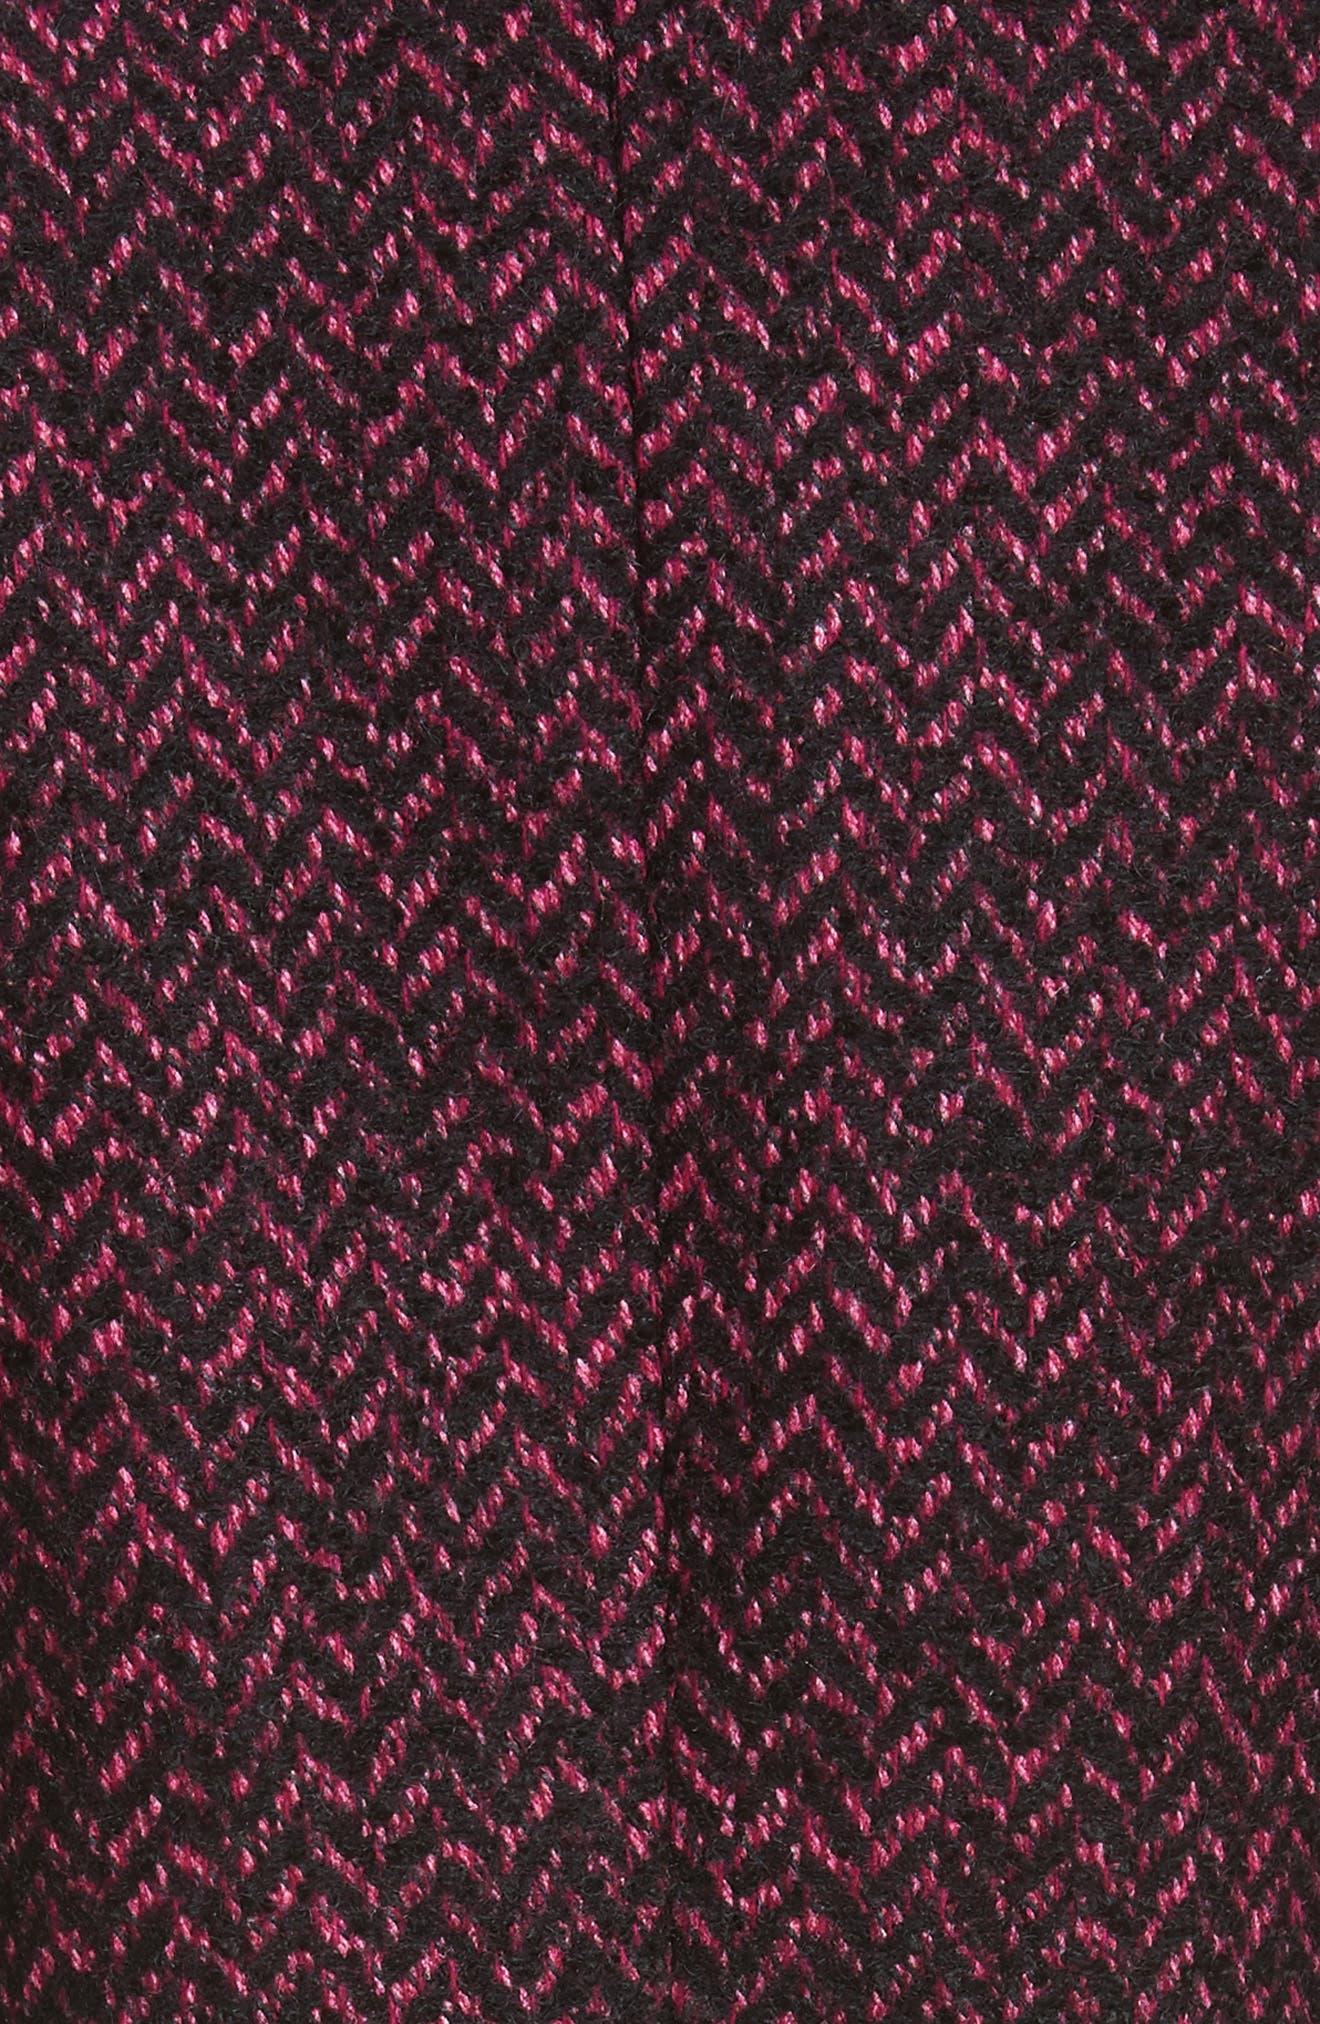 Herringbone Wool Blend Jacket,                             Alternate thumbnail 5, color,                             Magnolia/ Black